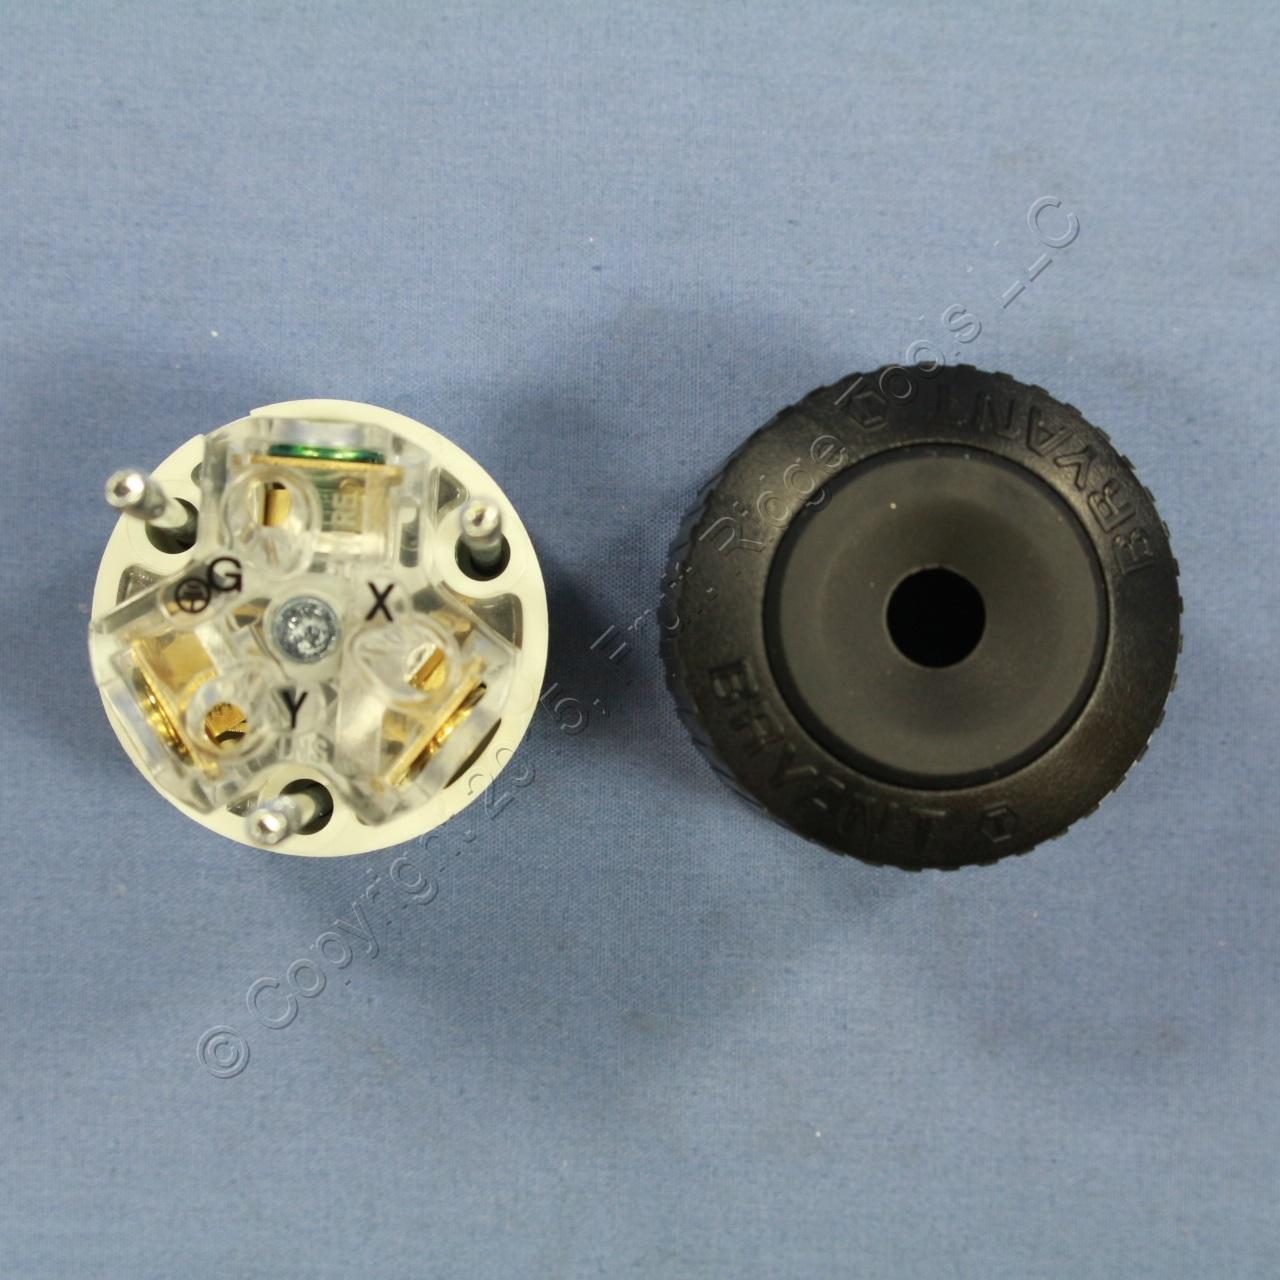 SpeedNut Flat Type ScrSz 10-24 L .63 P.O 450 Pieces